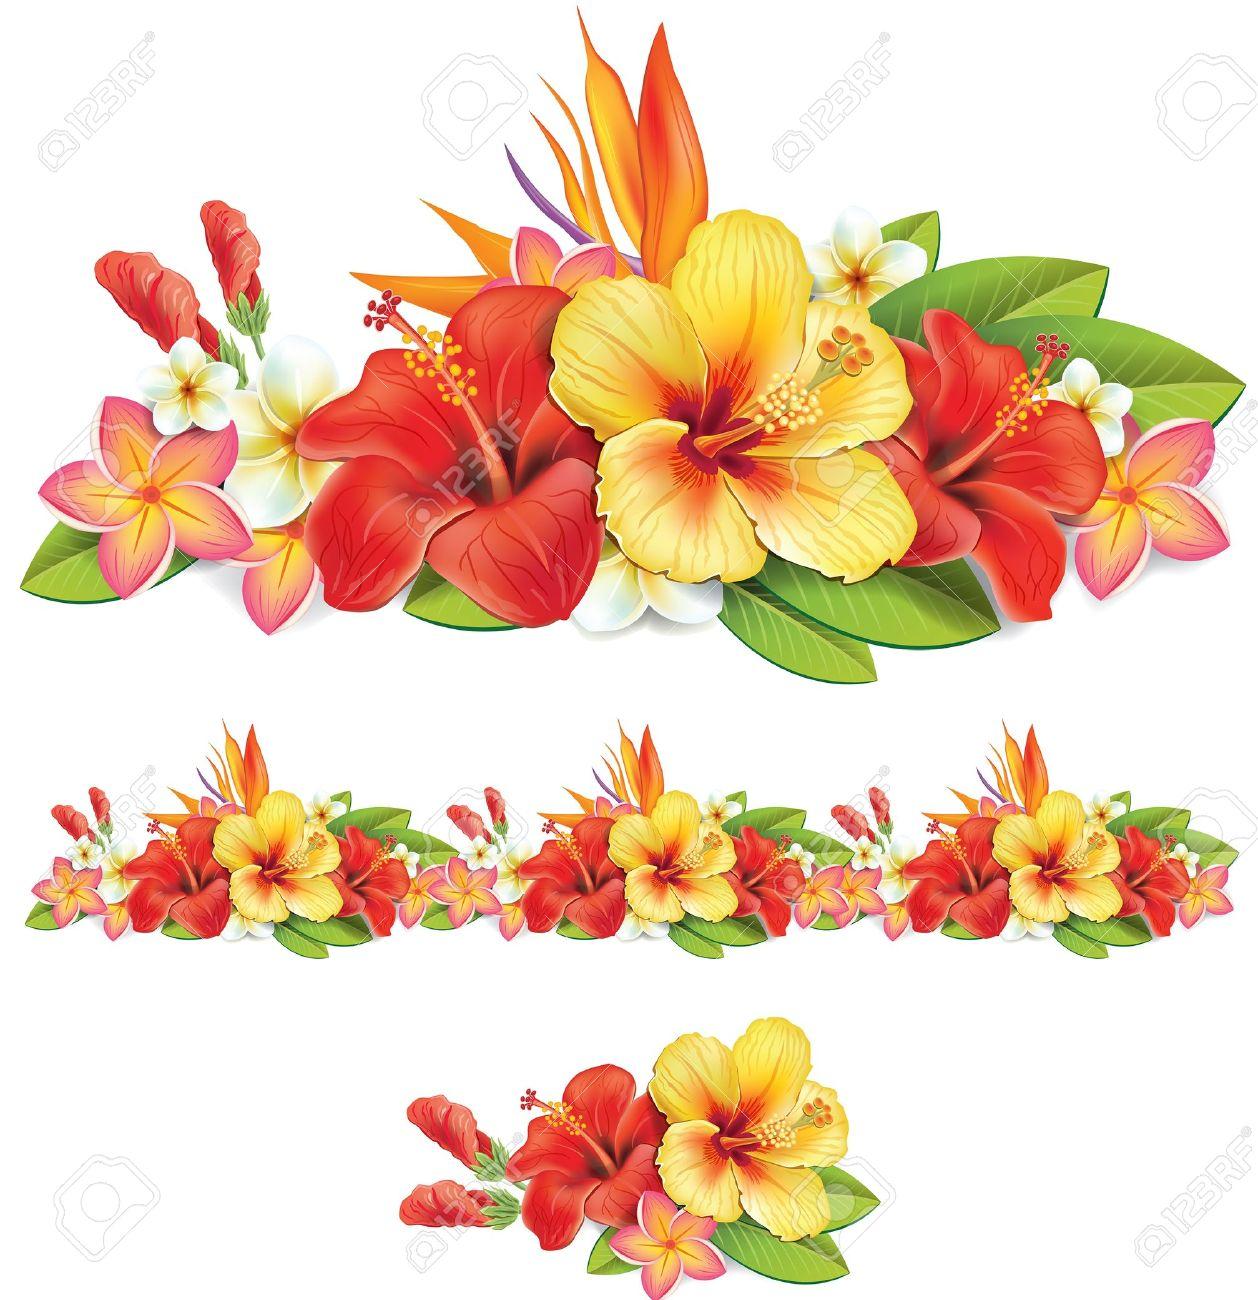 Hibiscus flower clipart image hibiscus flower - Red Hibiscus Flower Garland Of Of Tropical Flowers Illustration